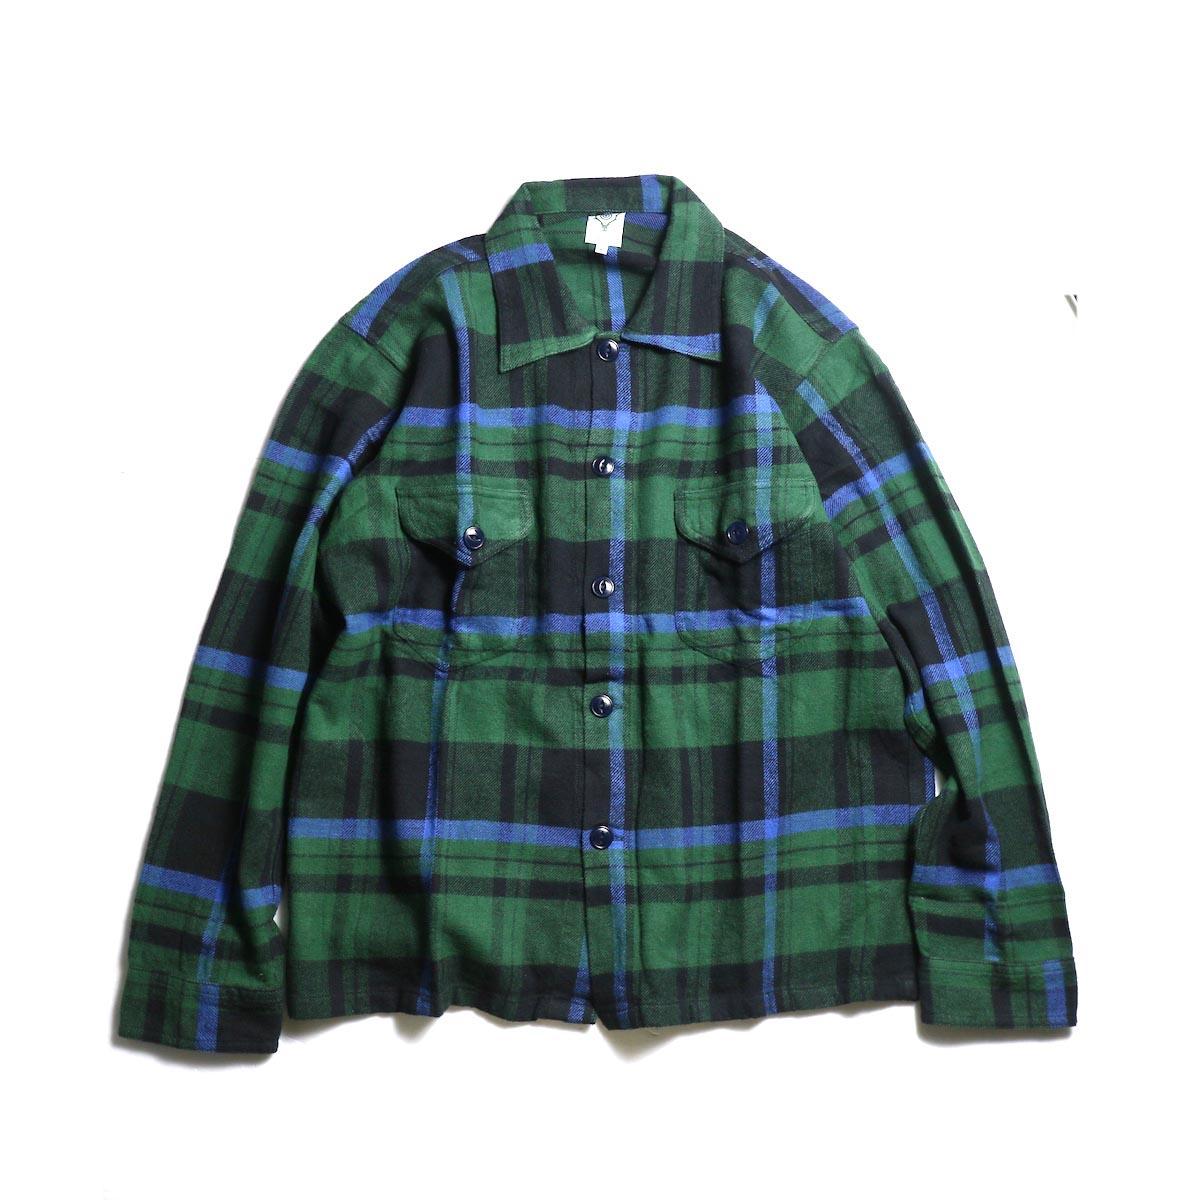 SOUTH2 WEST8 / Smokey Shirt - Cotton Twill / Plaid (Green)